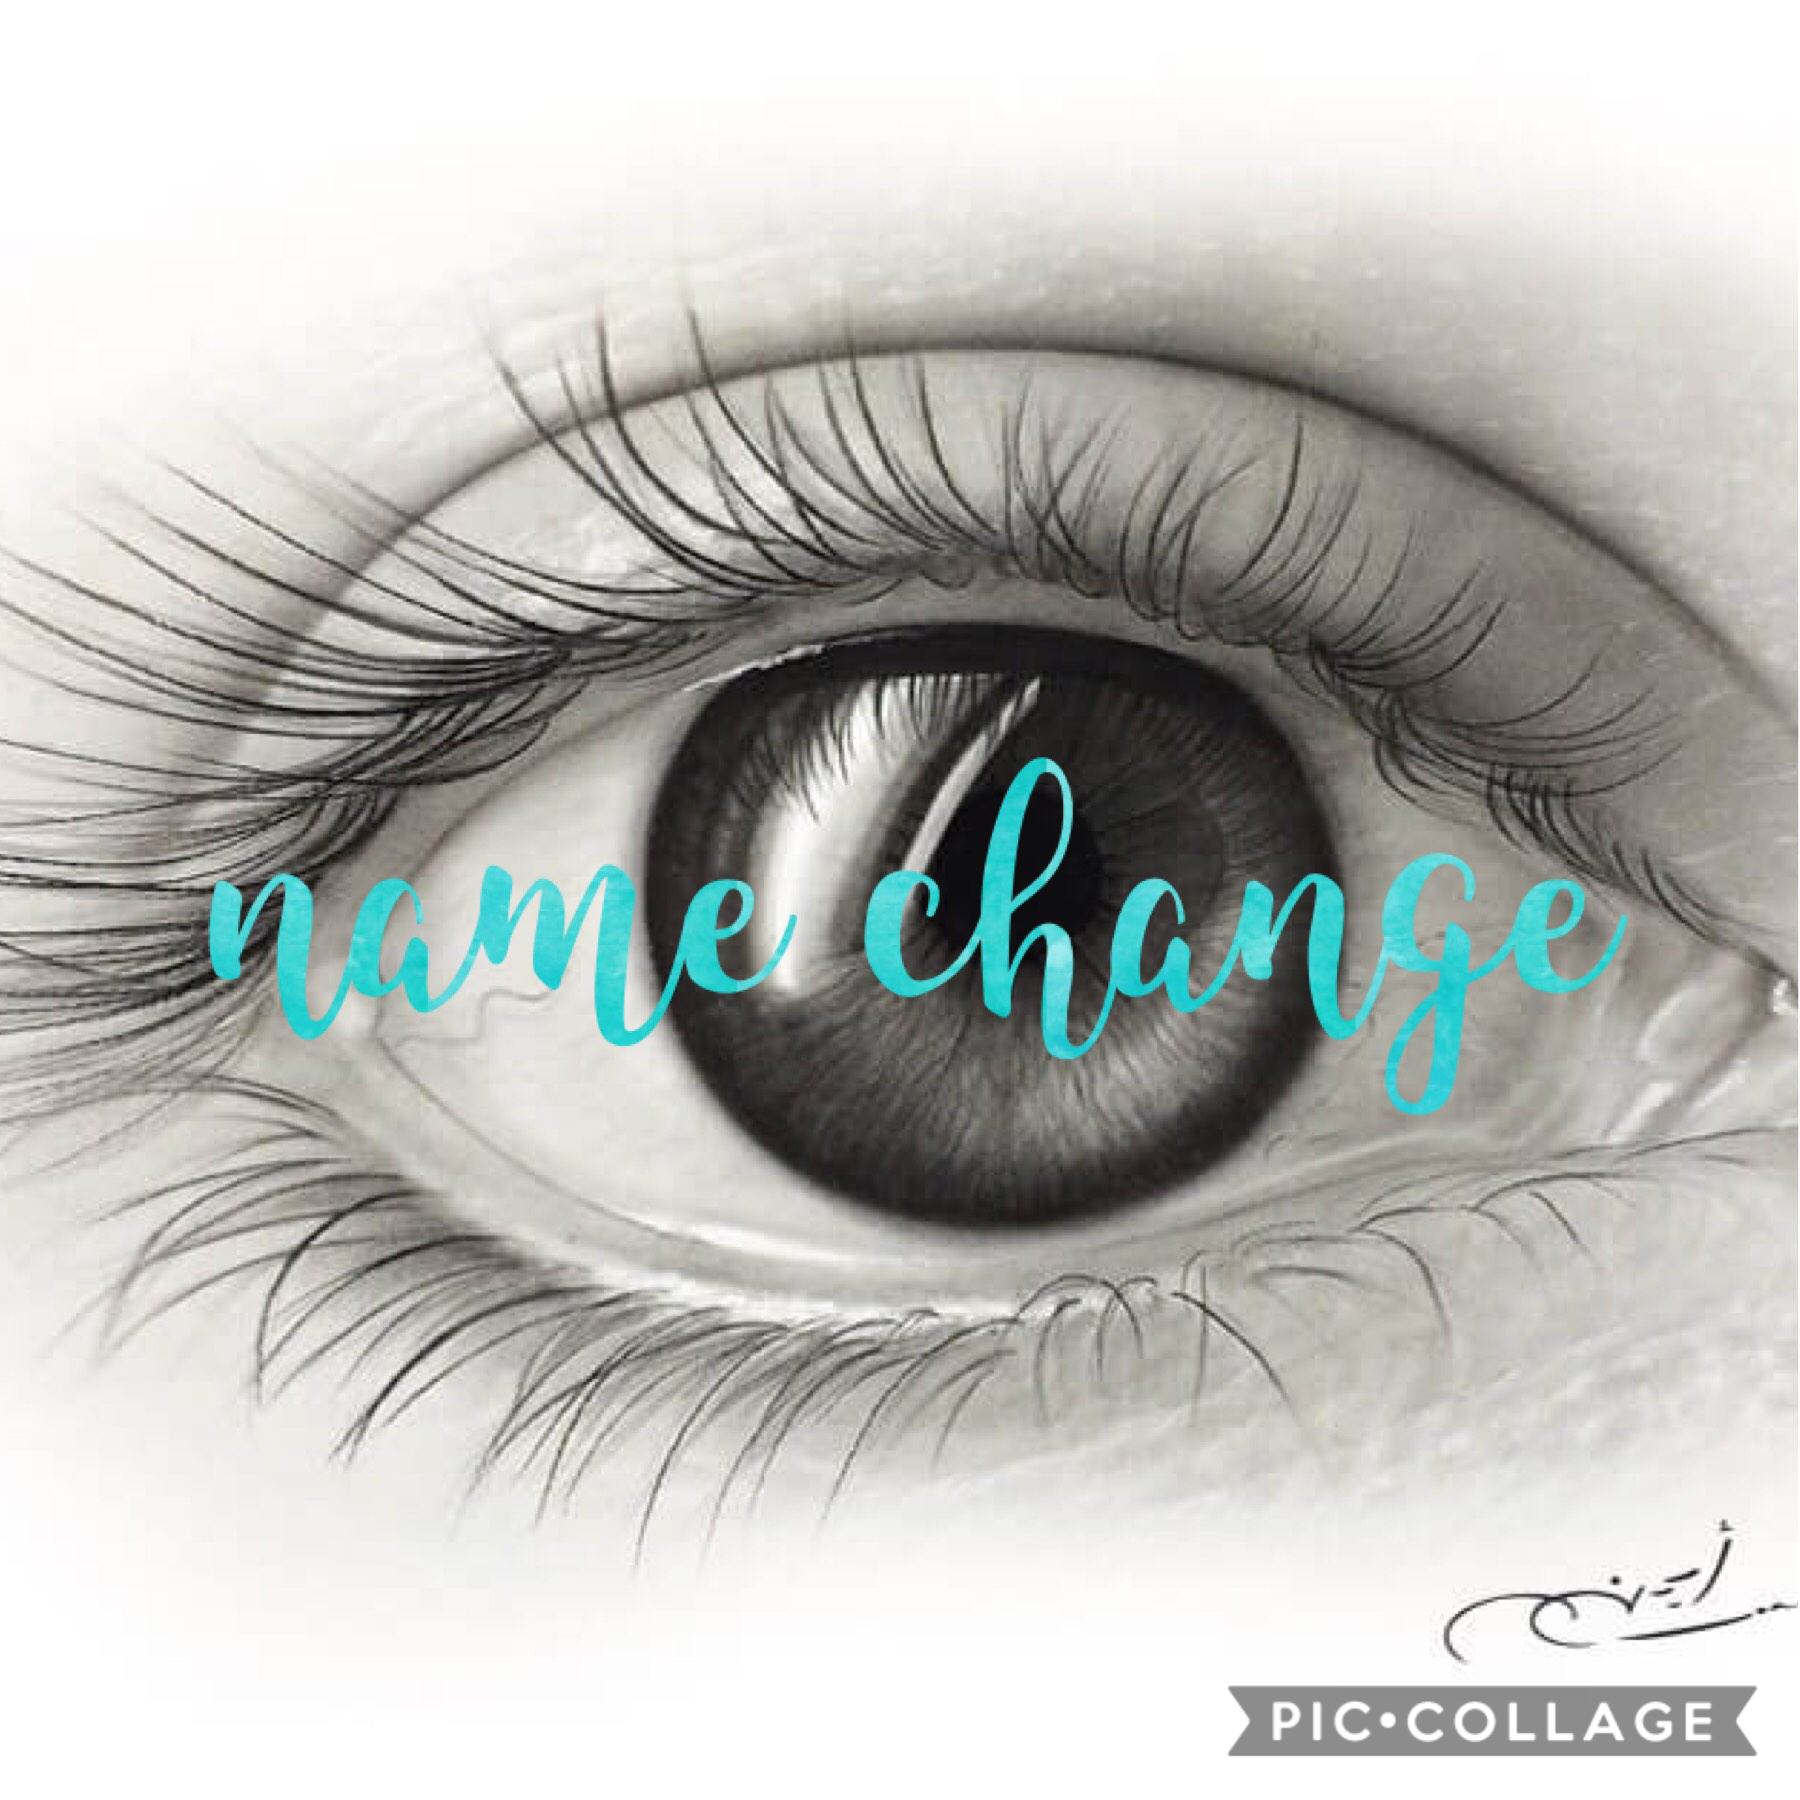 @wherearetheavocados < my new name as u already knoww